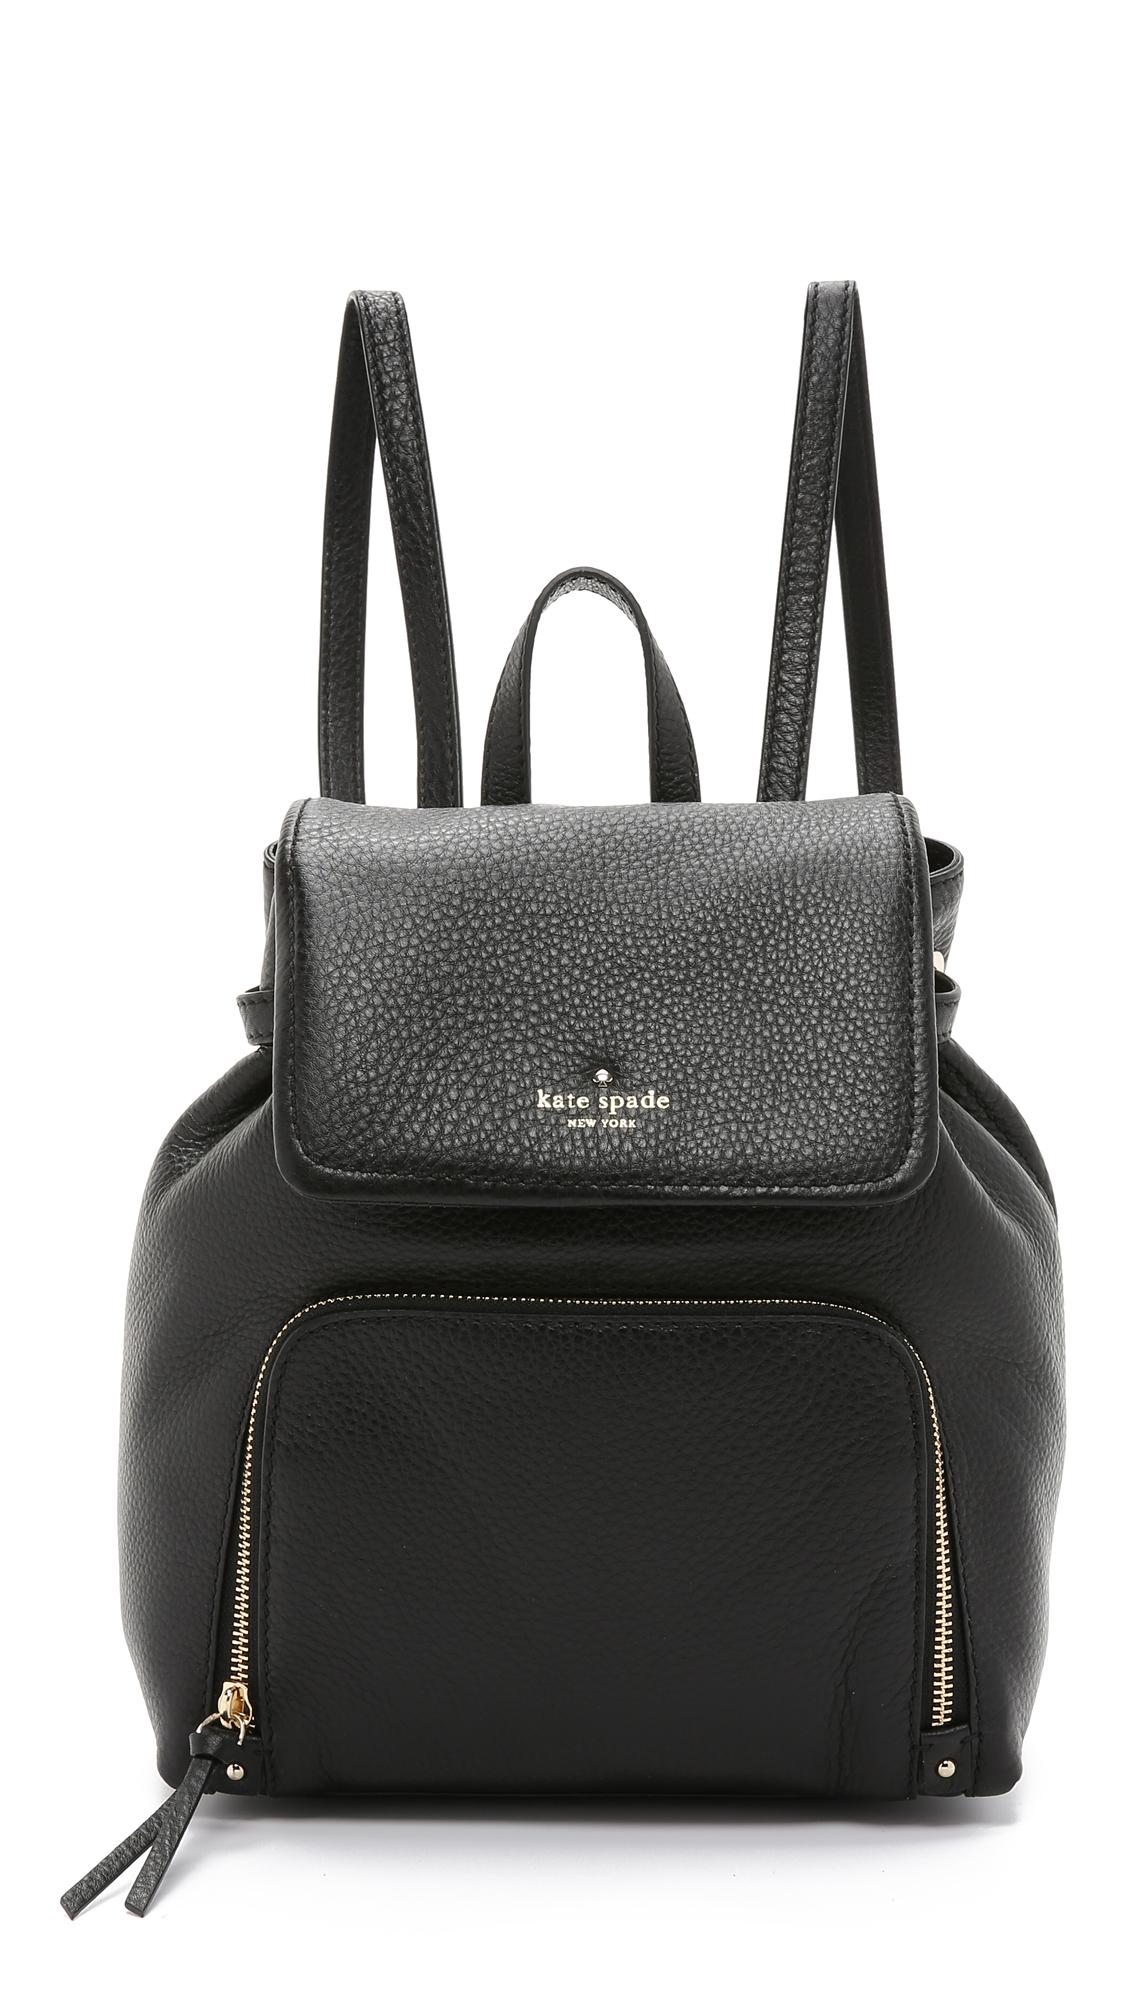 Kate spade Charley Backpack in Black | Lyst